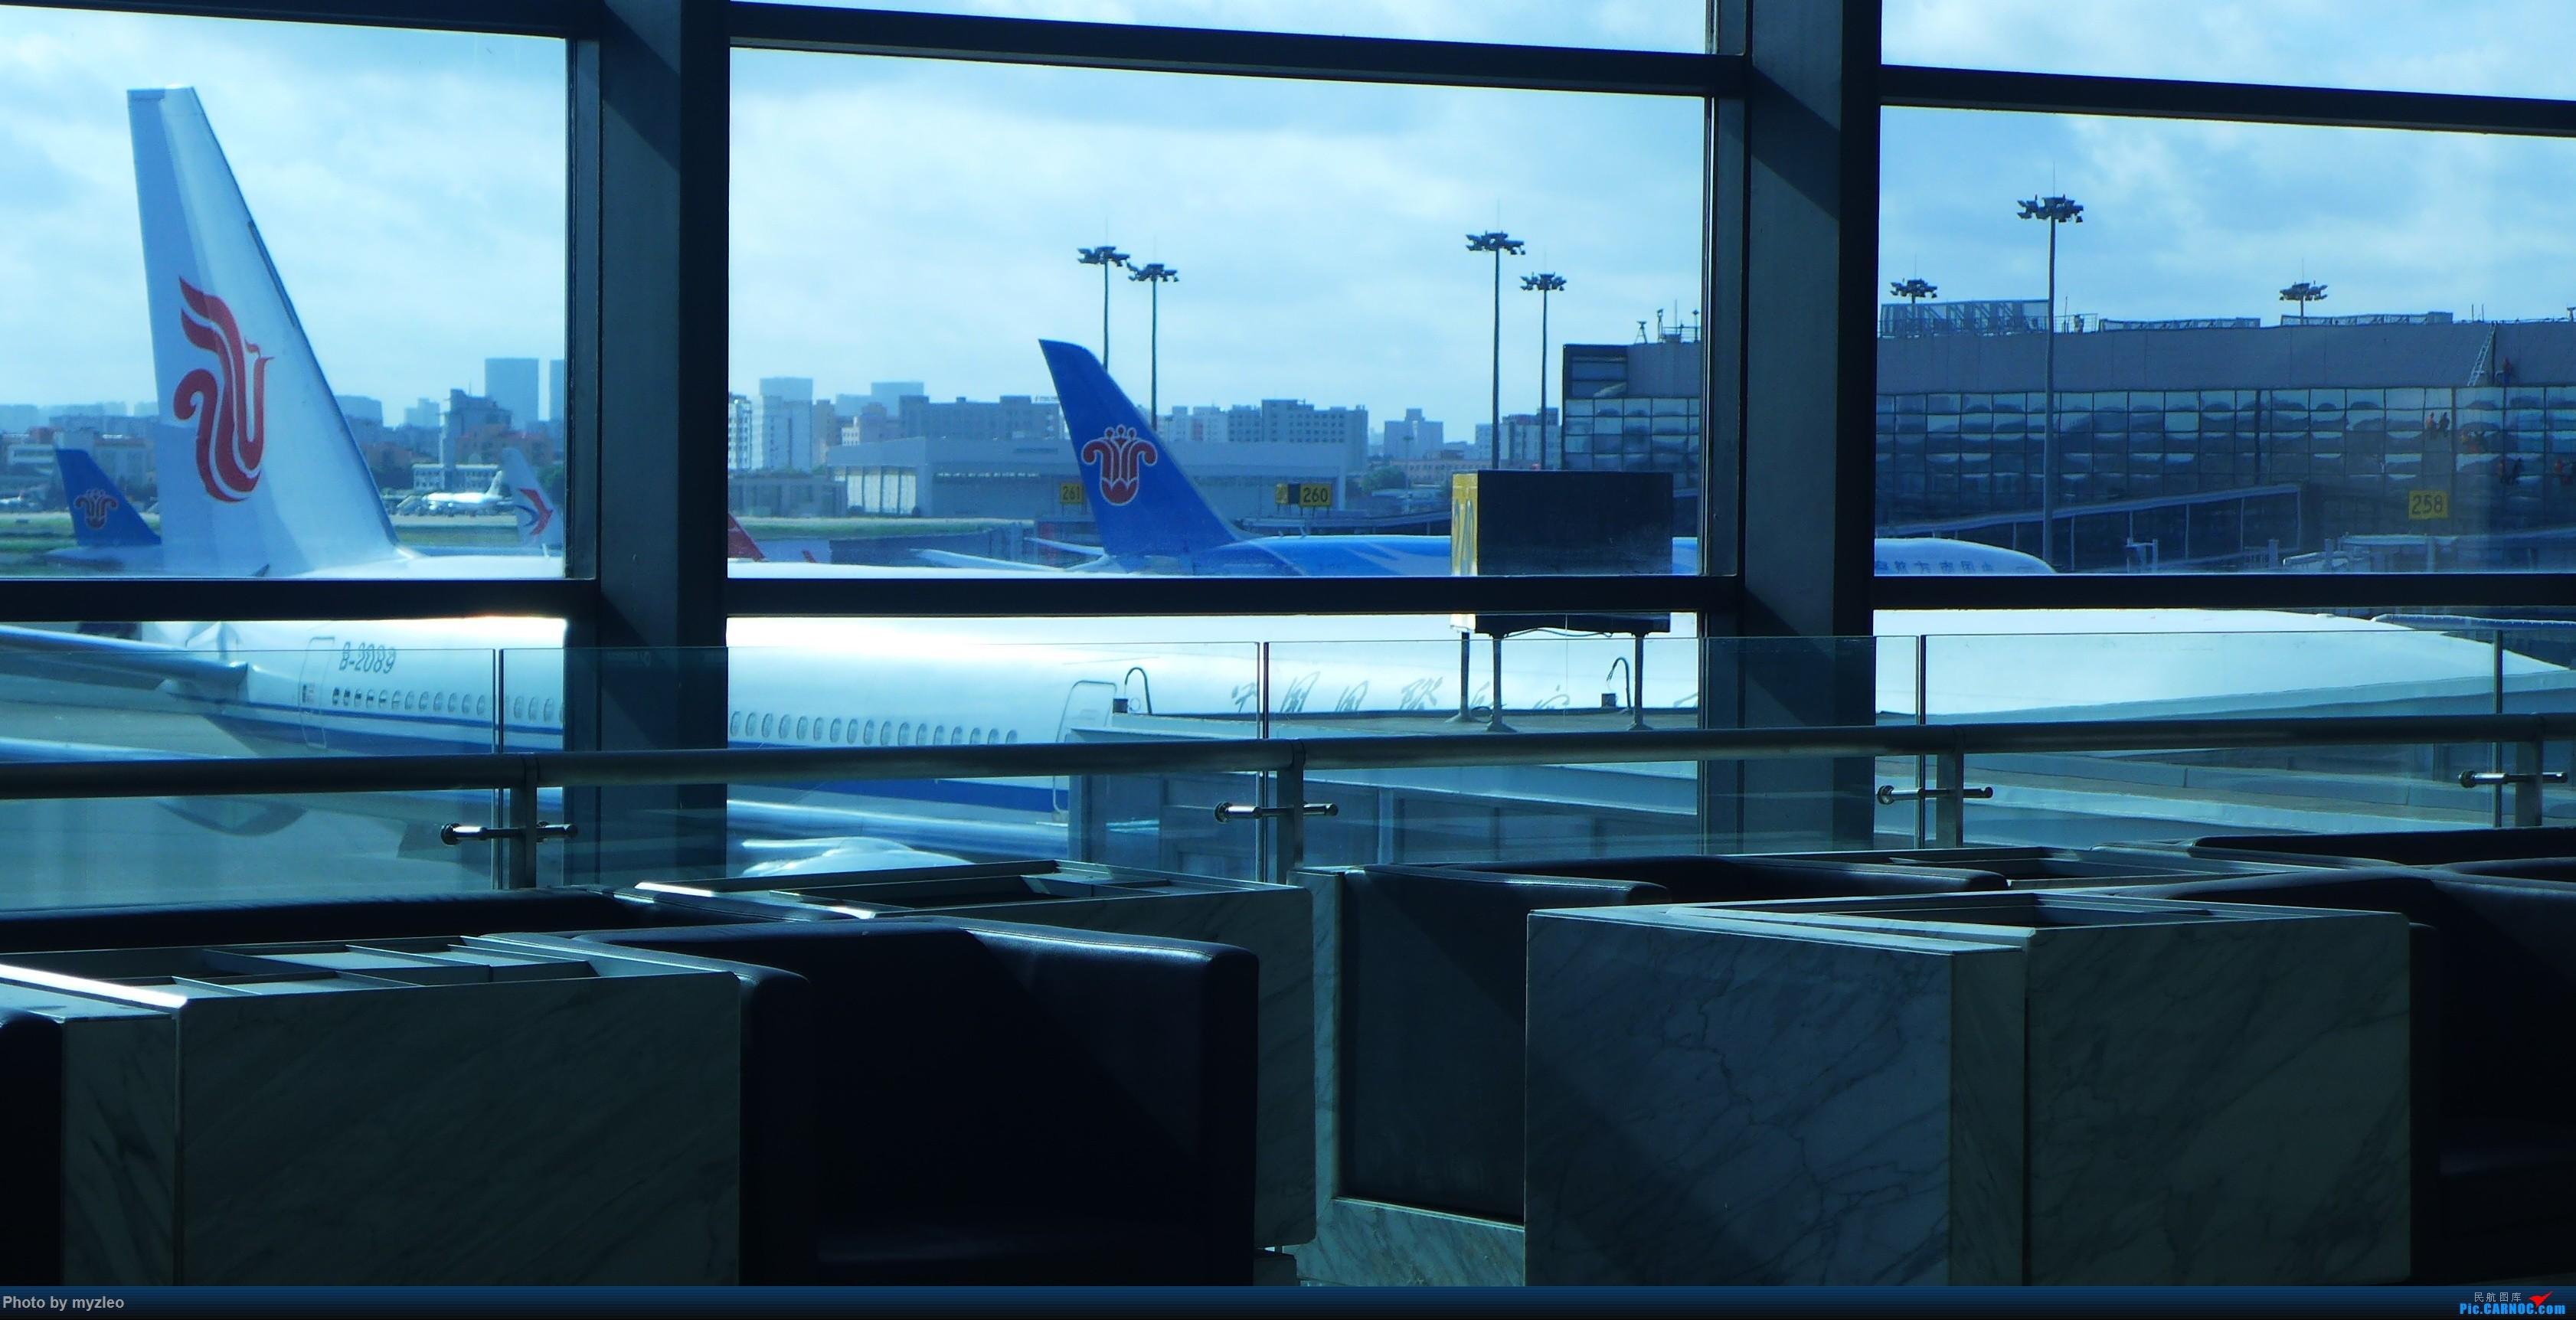 Re:[原创]【myzleo的游记2.1】昆洱风光(1)——SHA-KMG上航商务舱再体验+人在昆明 BOEING 777-300ER B-2089 中国上海虹桥国际机场